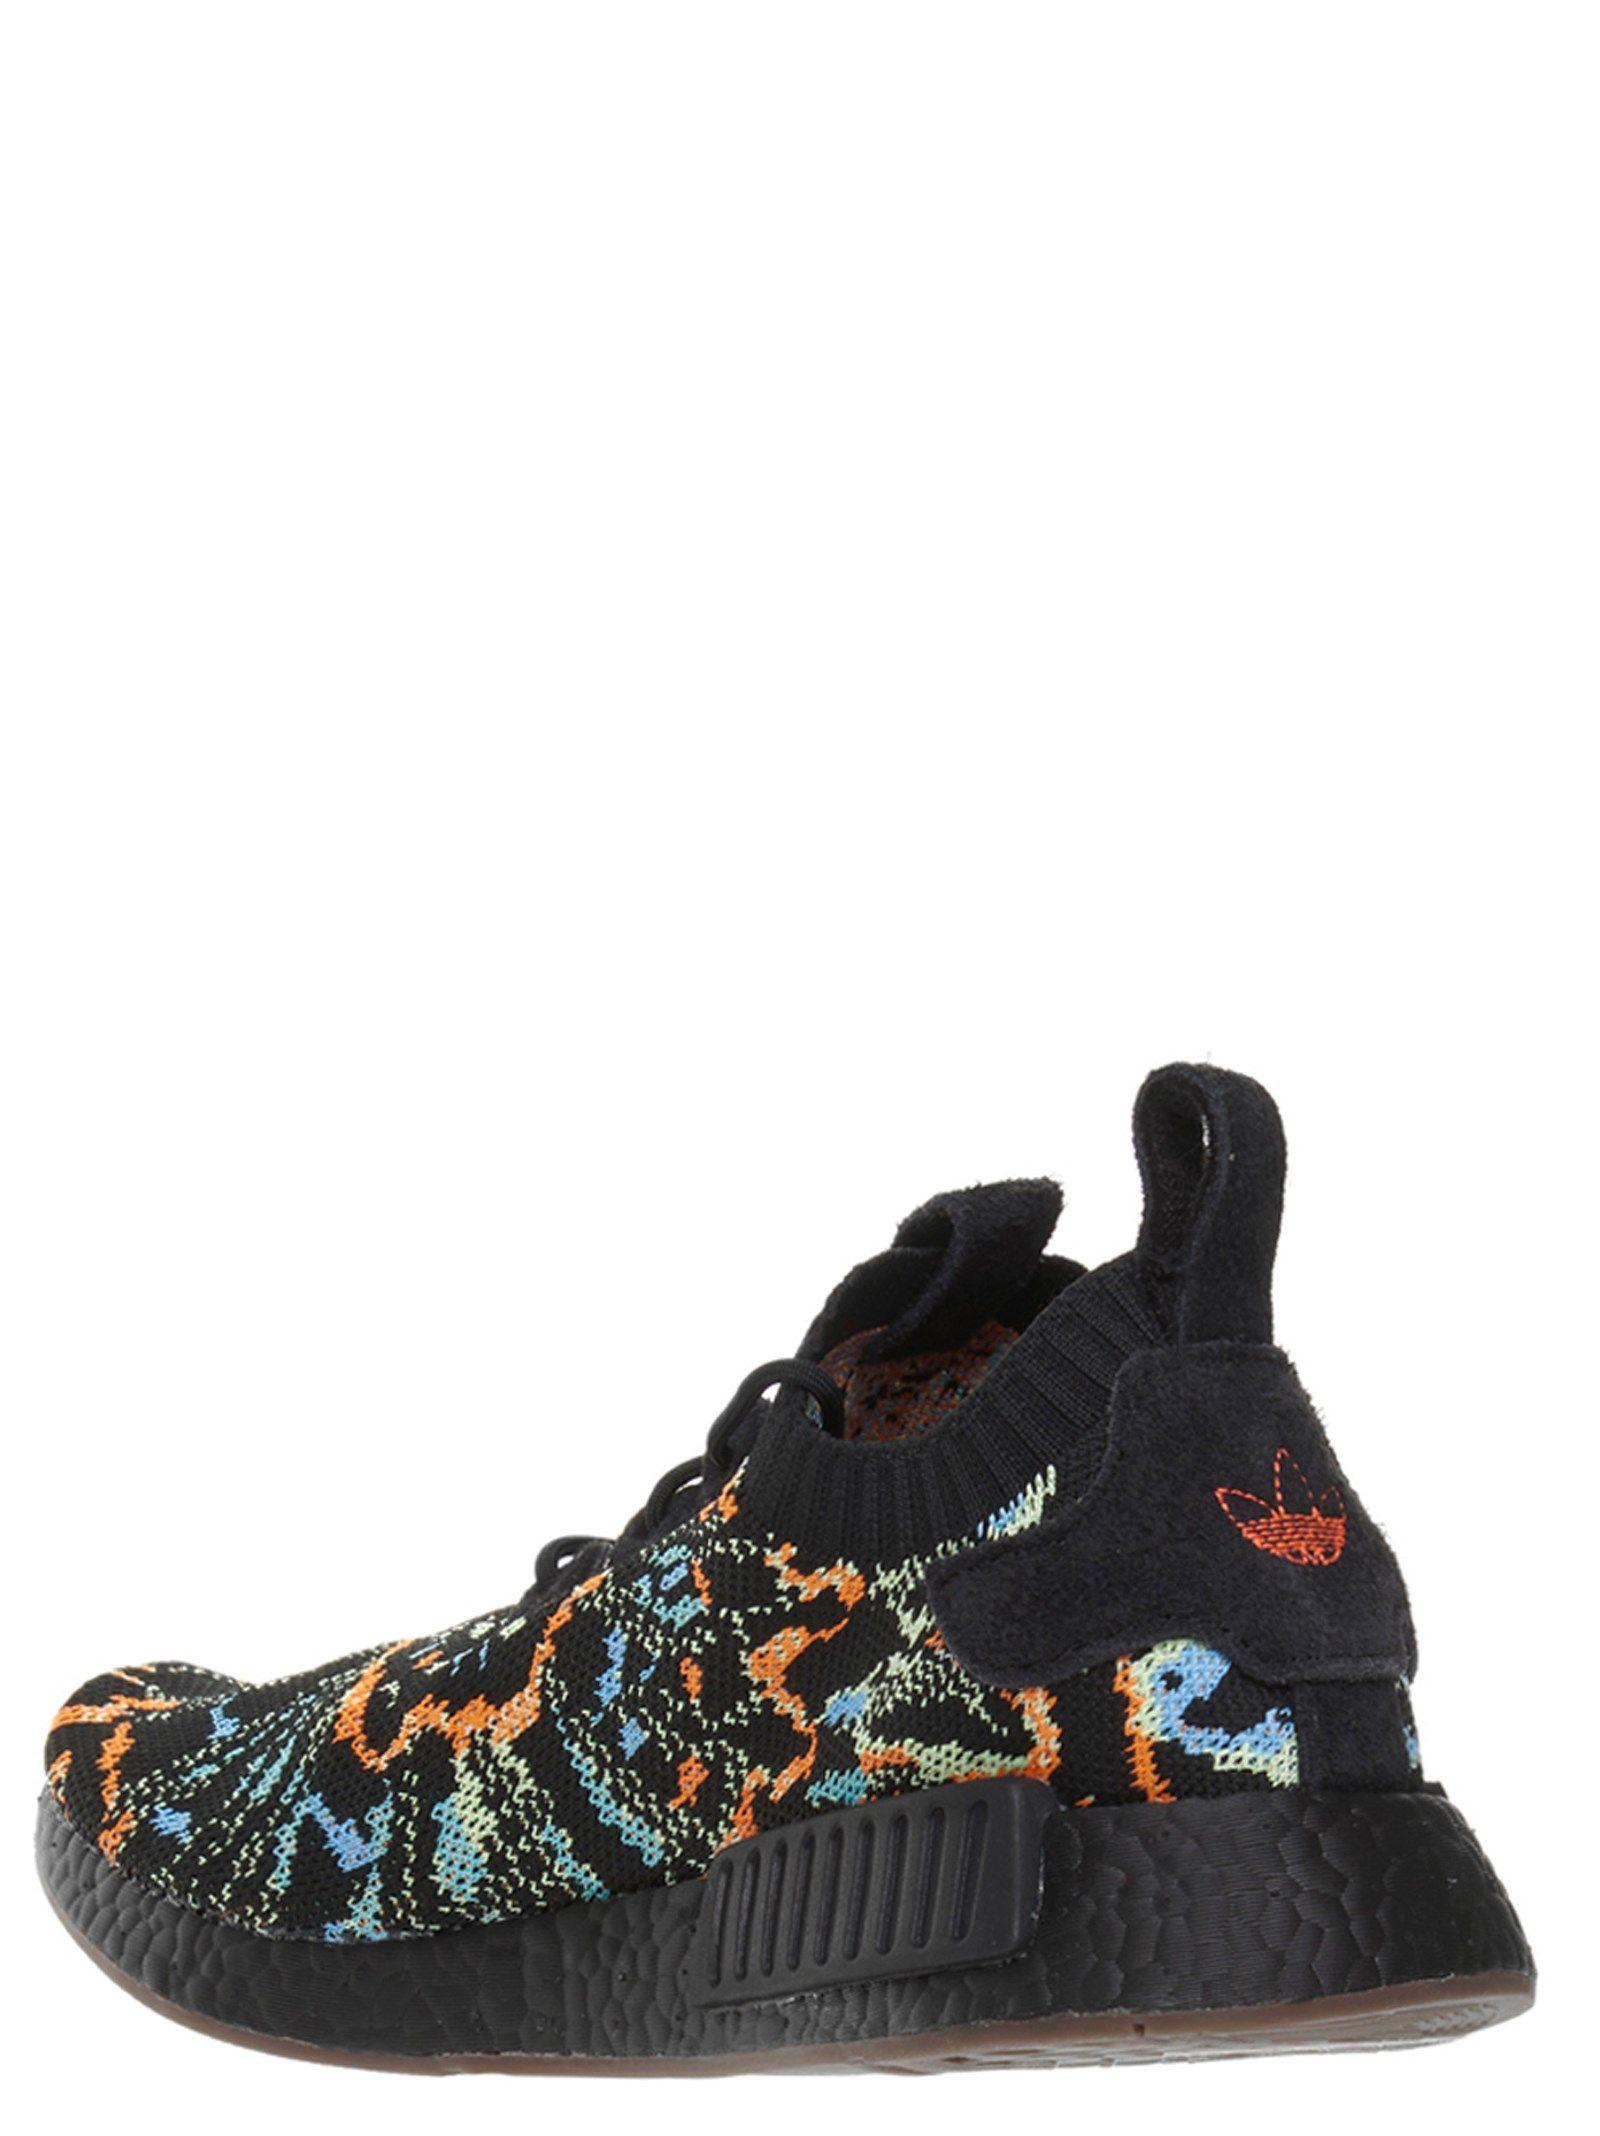 ADIDAS ORIGINALS Sneakers ADIDAS MEN'S BLACK OTHER MATERIALS SNEAKERS